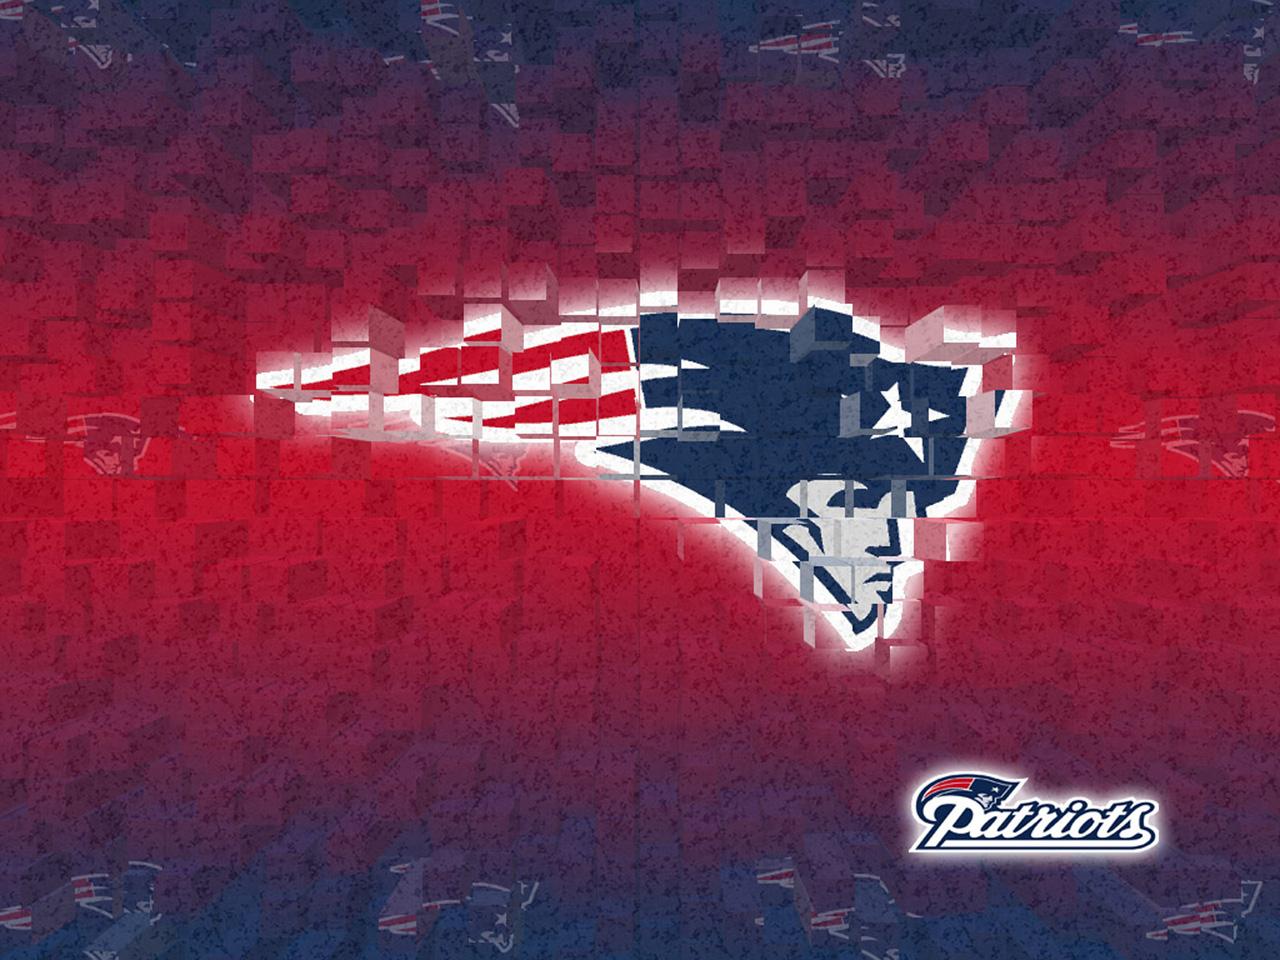 New England Patriots wallpaper New England Patriots wallpapers 1280x960